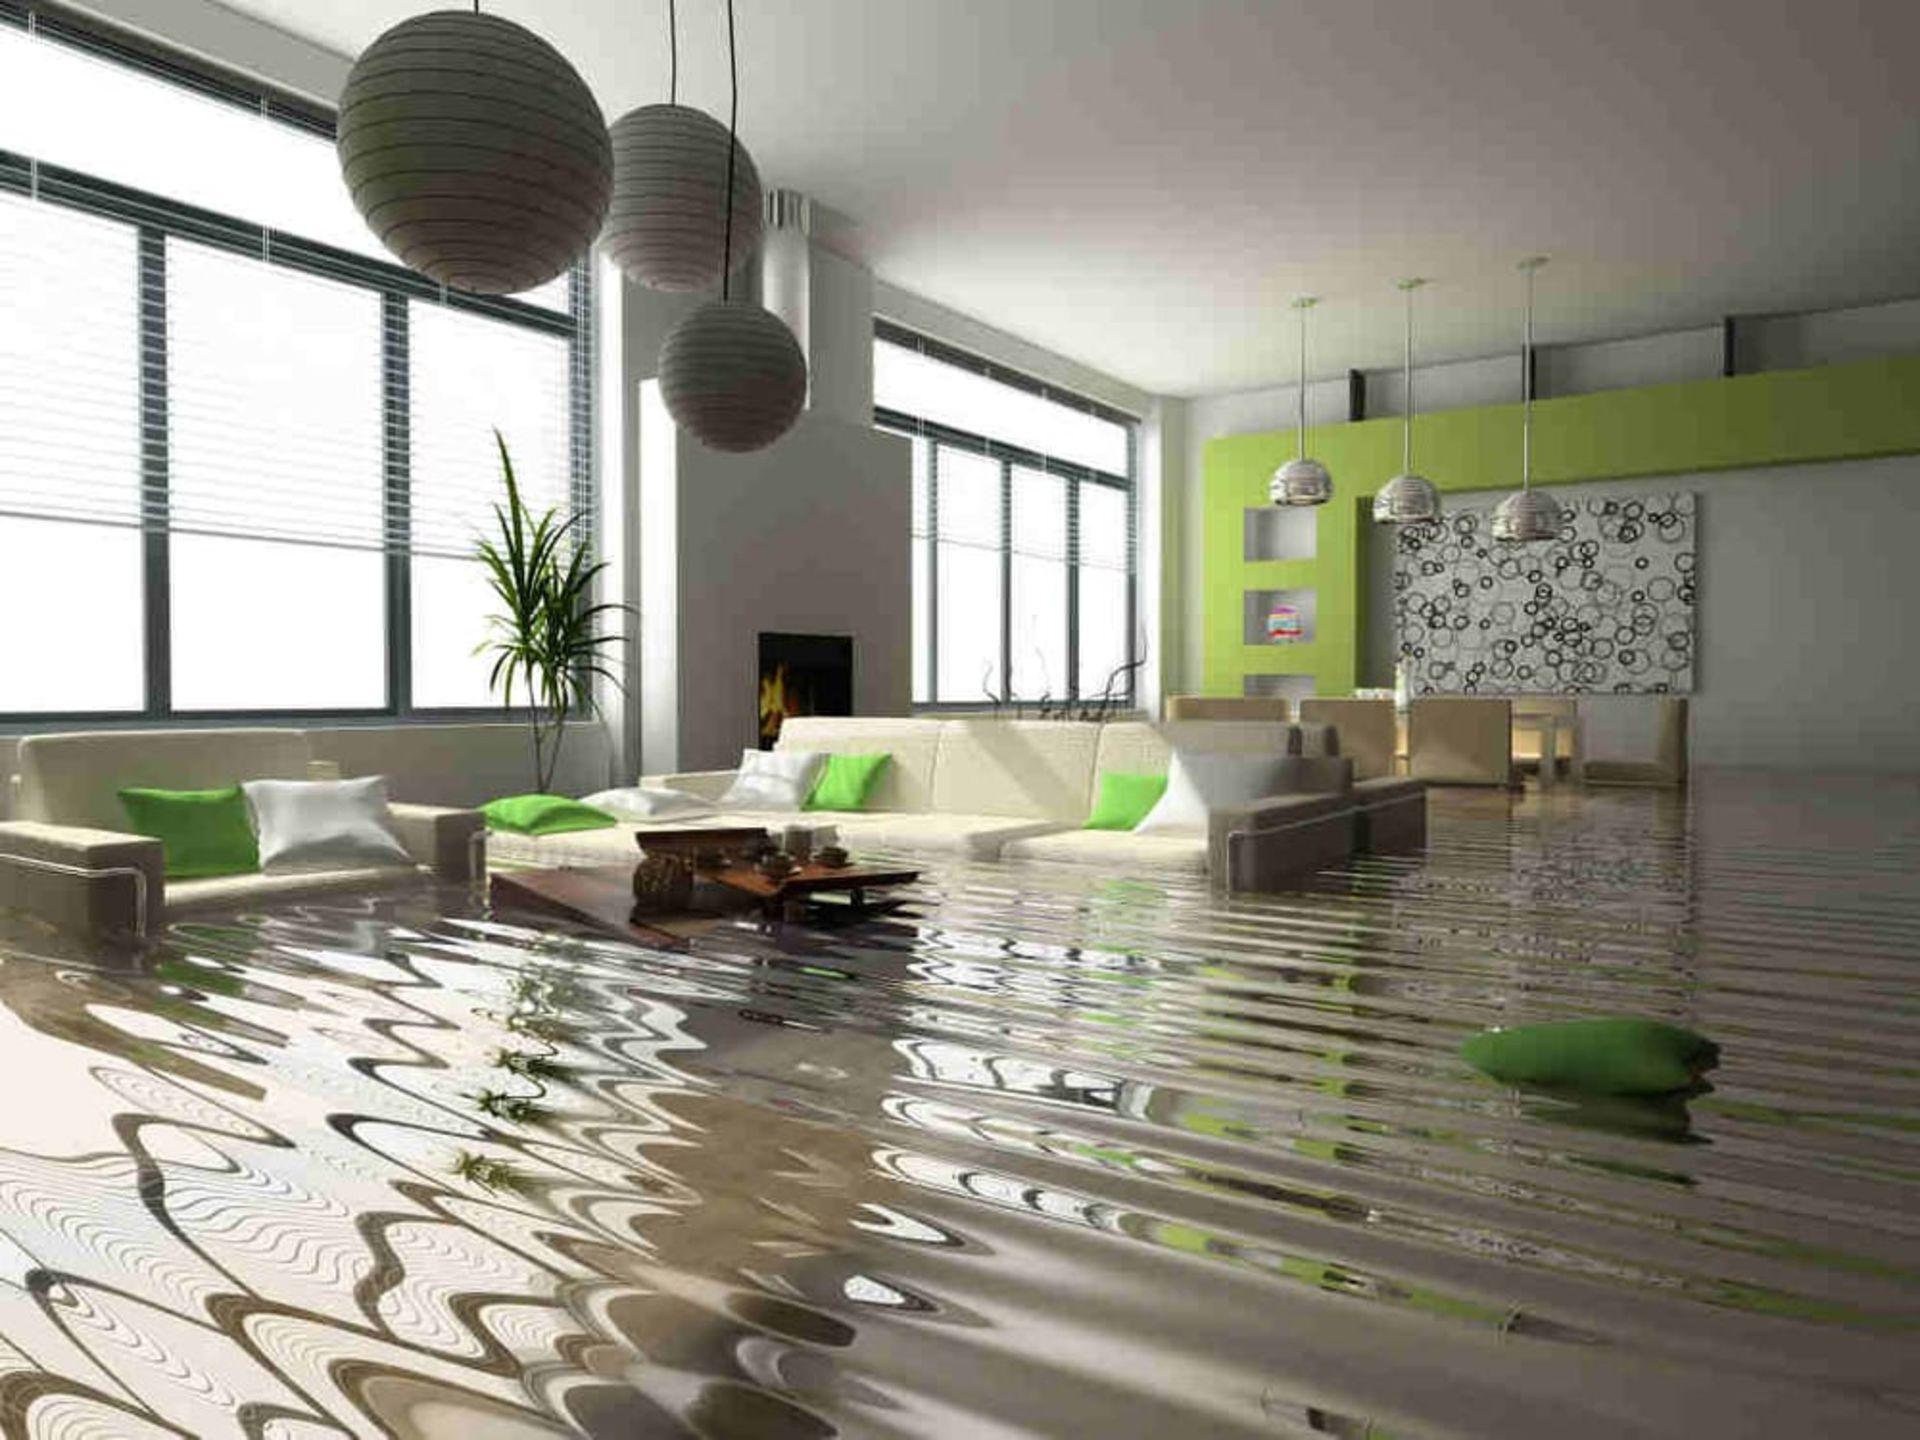 Waterproofing Your Basement: The Basics